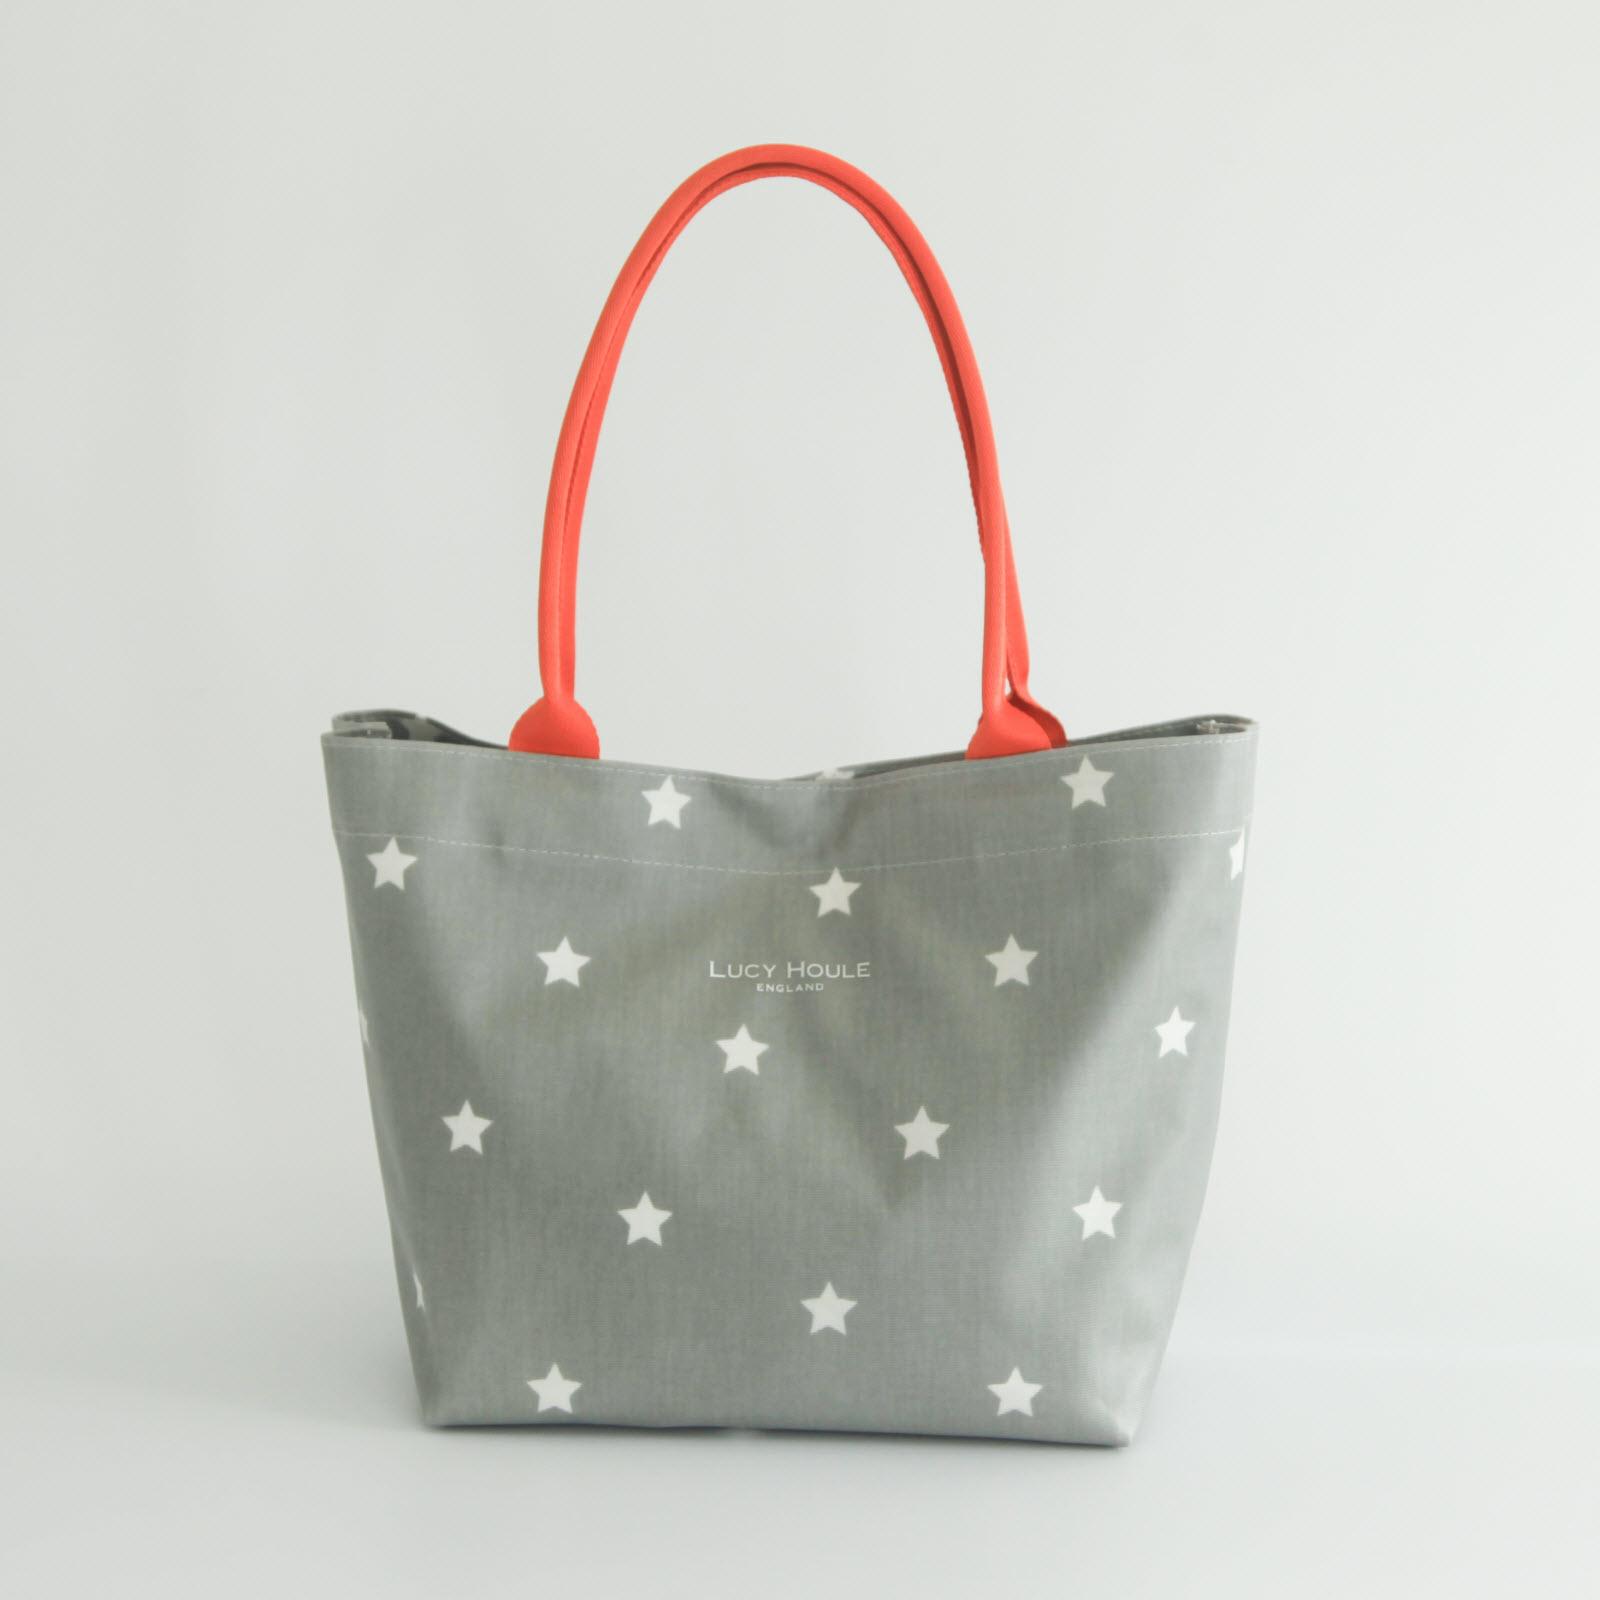 Grey White Star Small Tote Bag Orange Handles